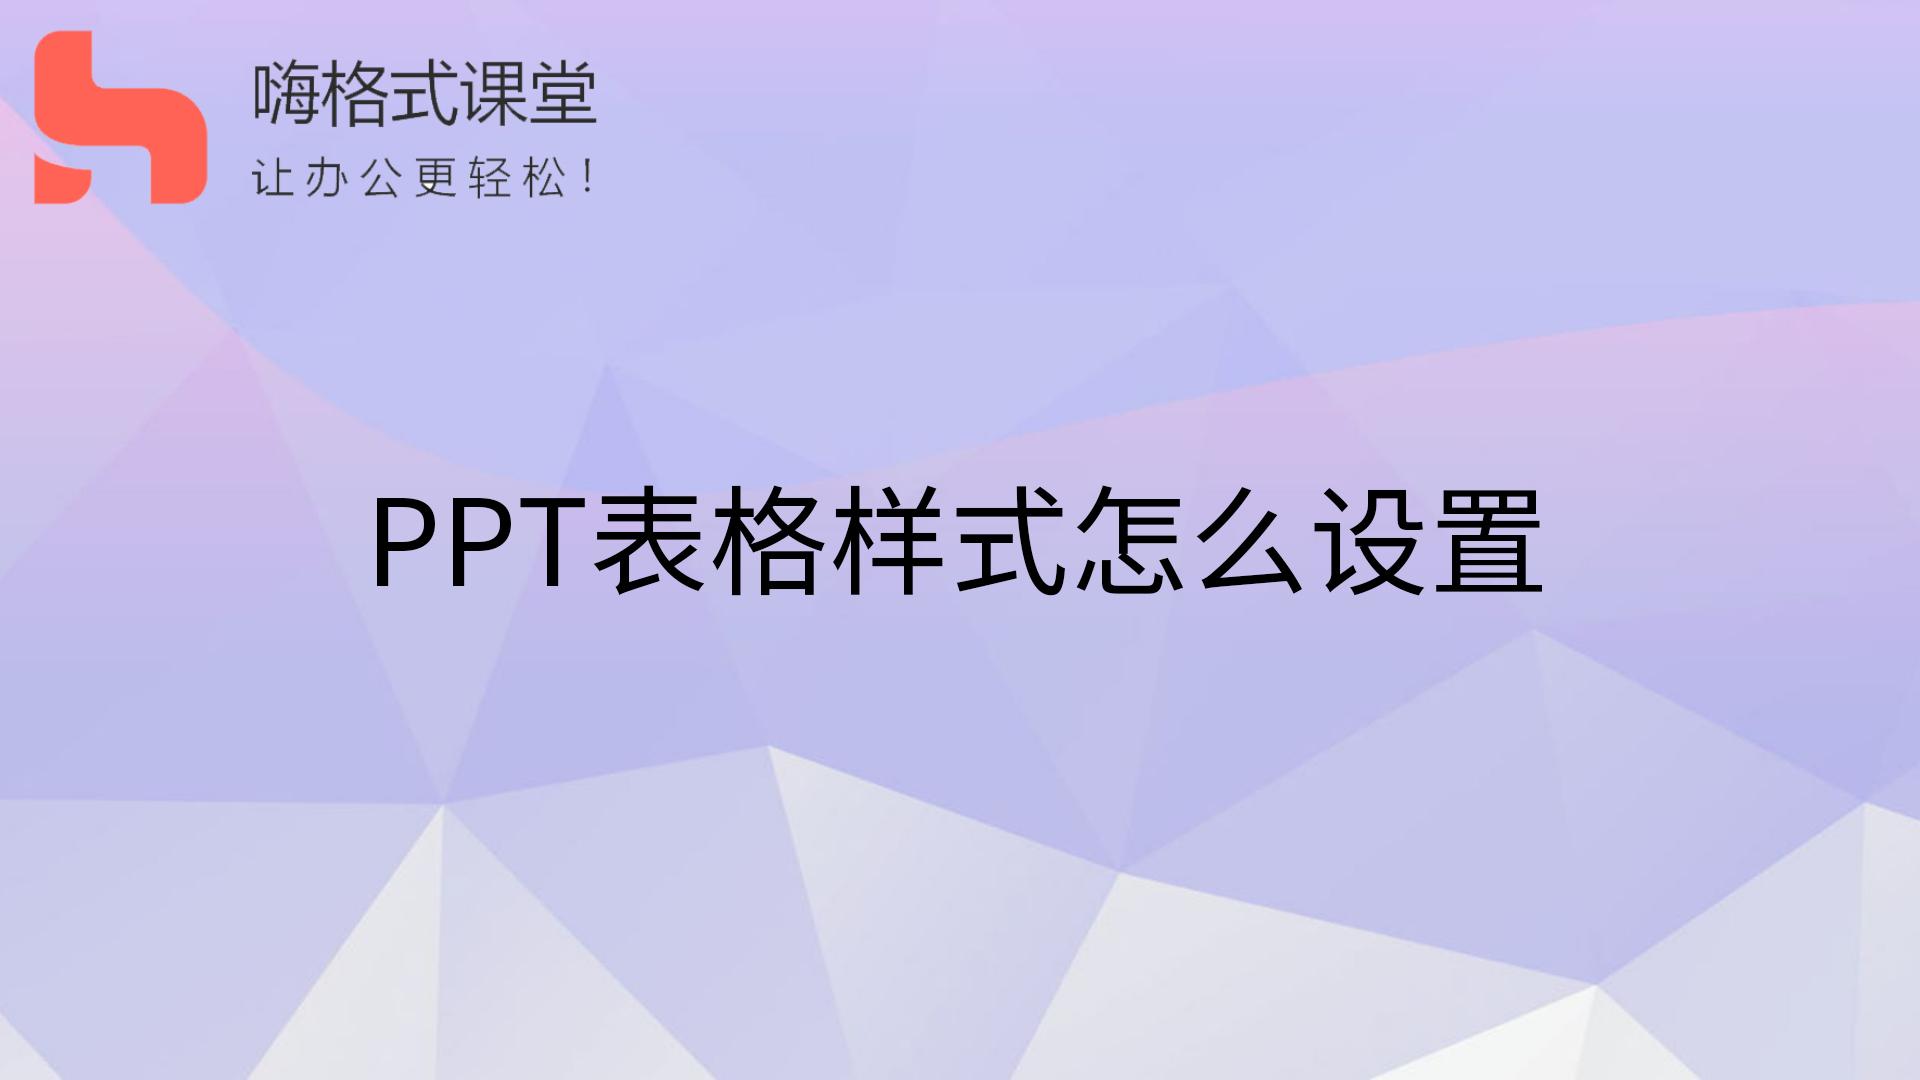 PPT表格样式怎么设置